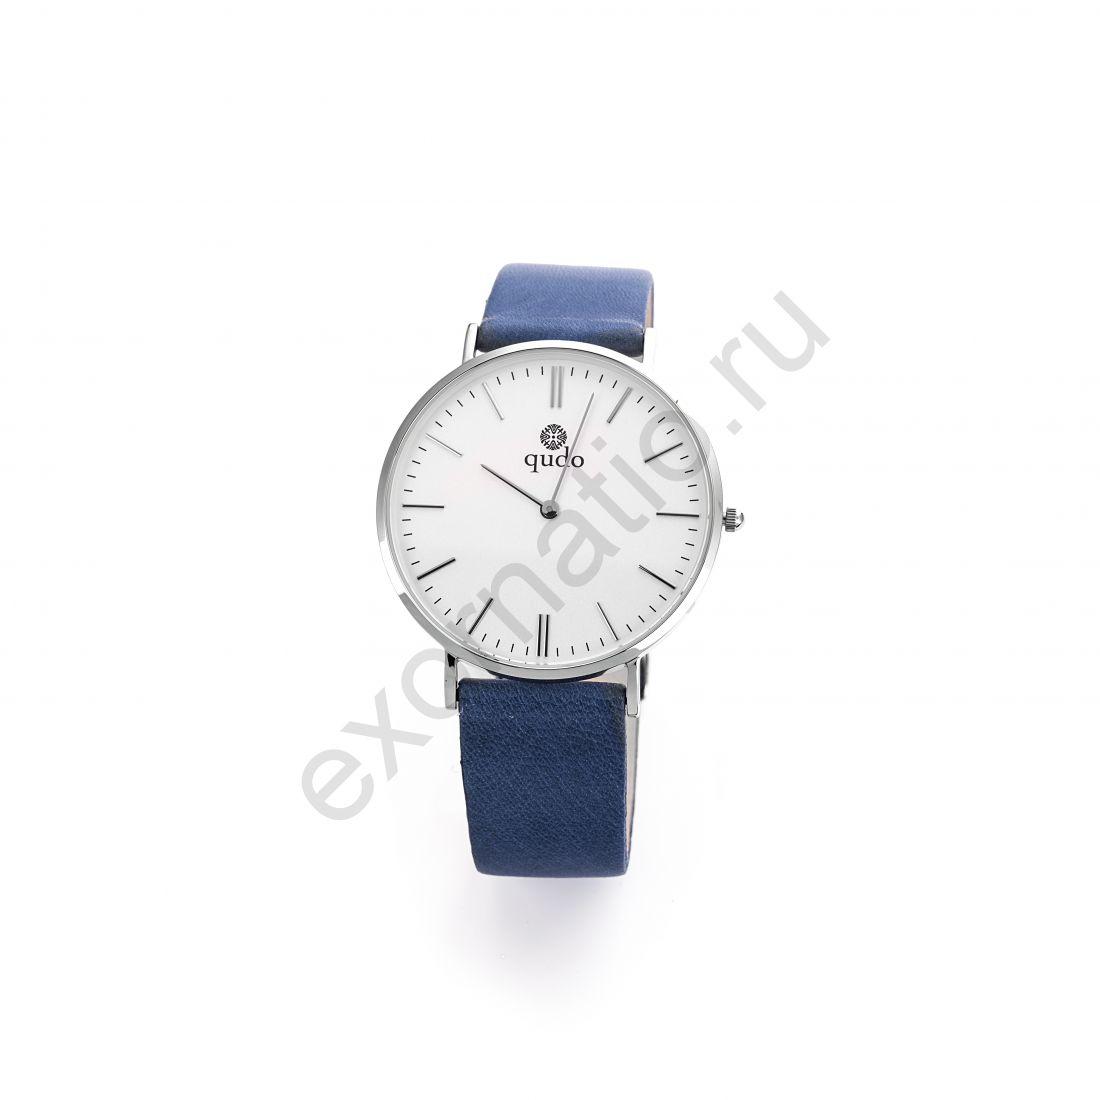 Наручные часы Qudo 801020 BL/S